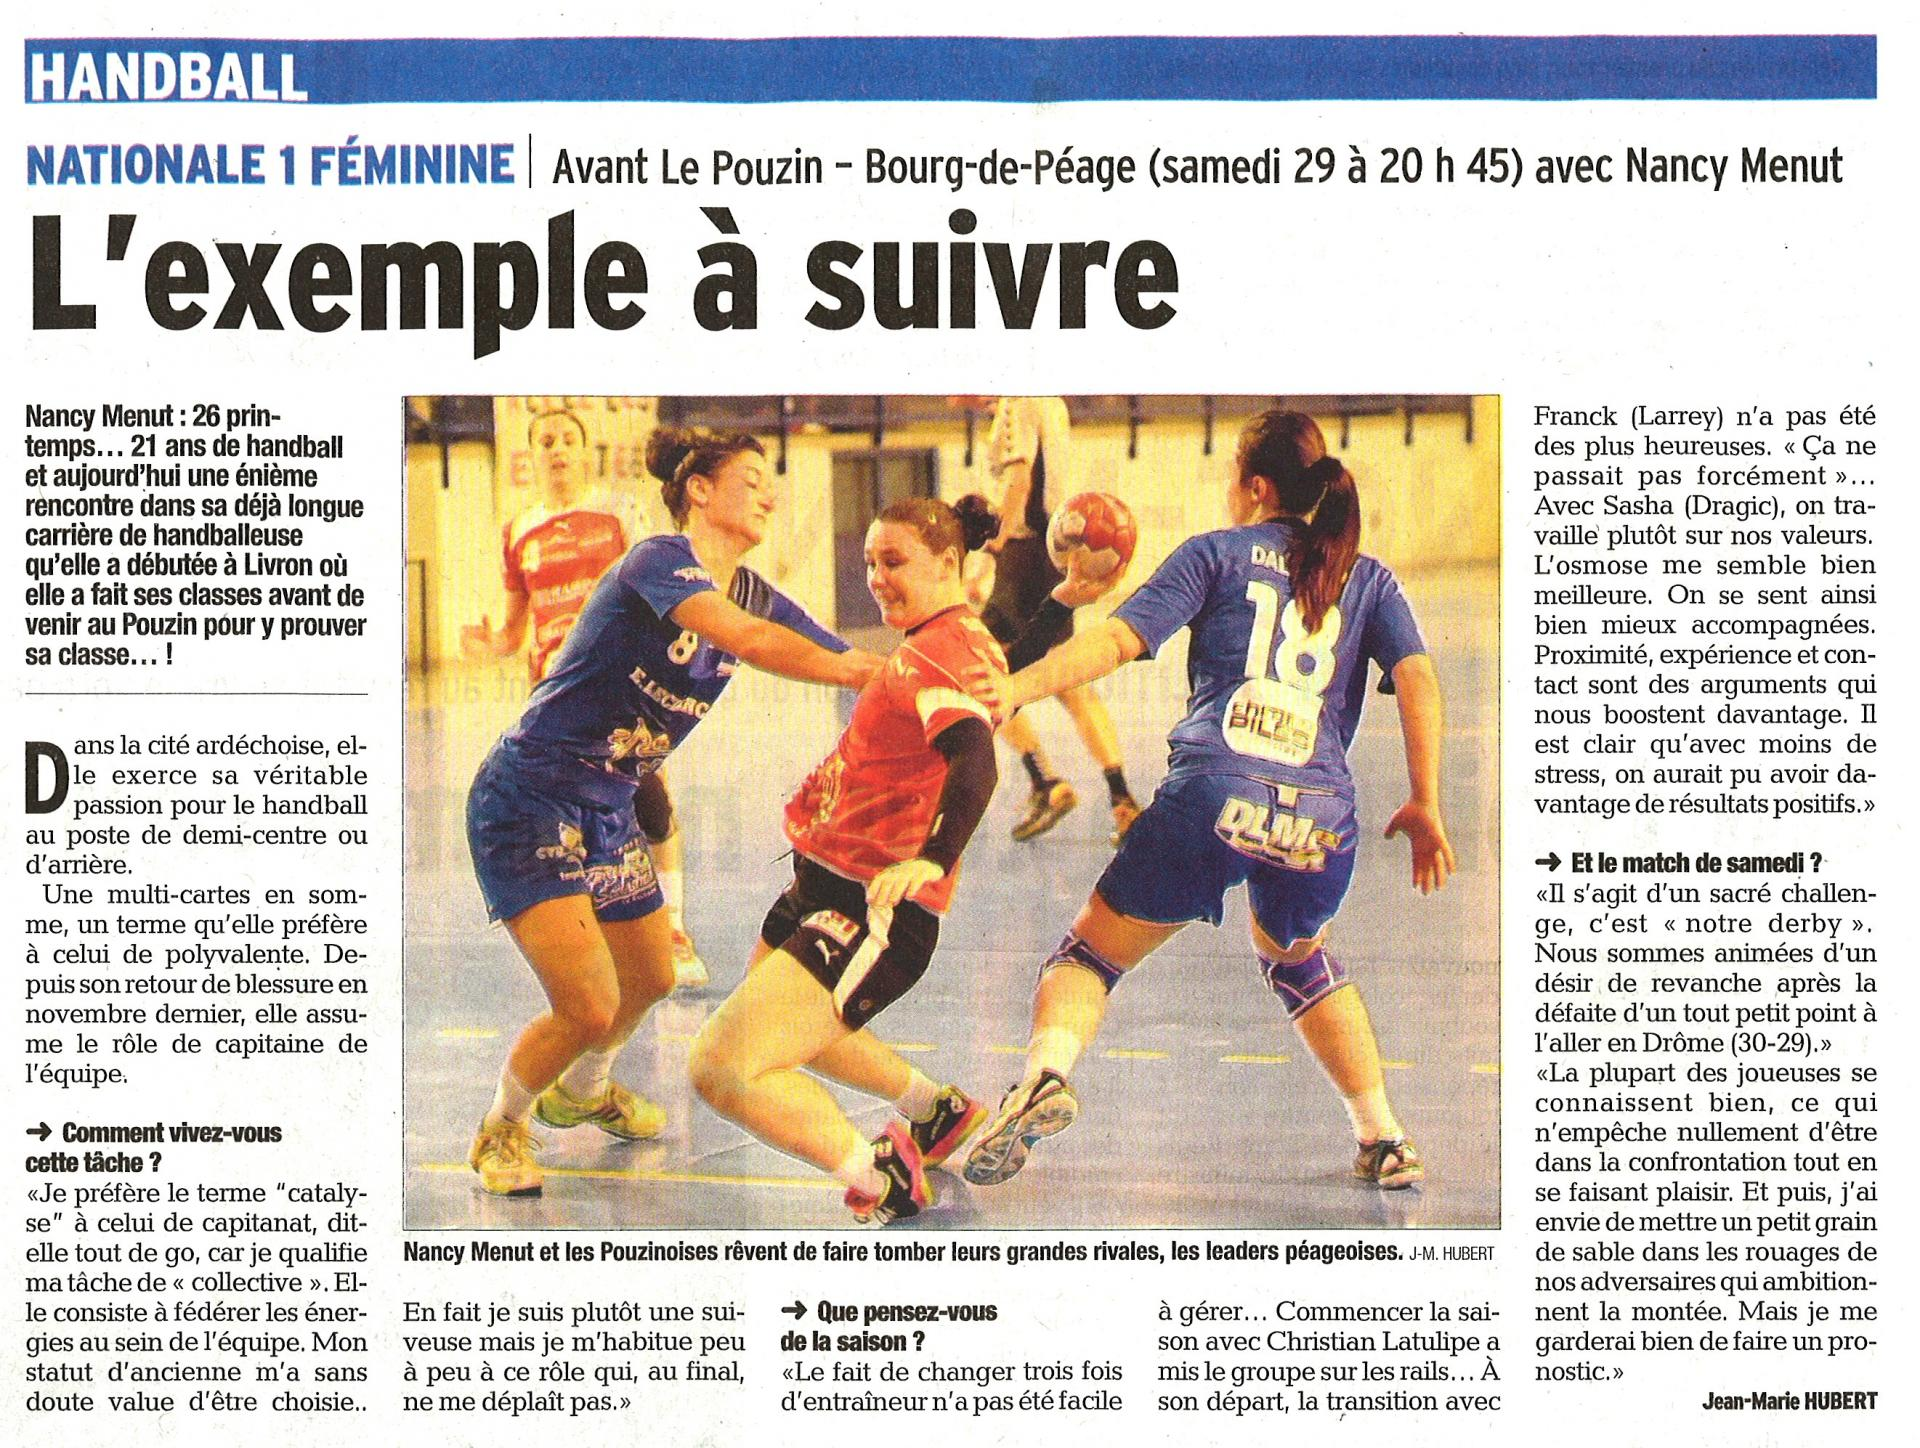 DL sports 28 03 2014